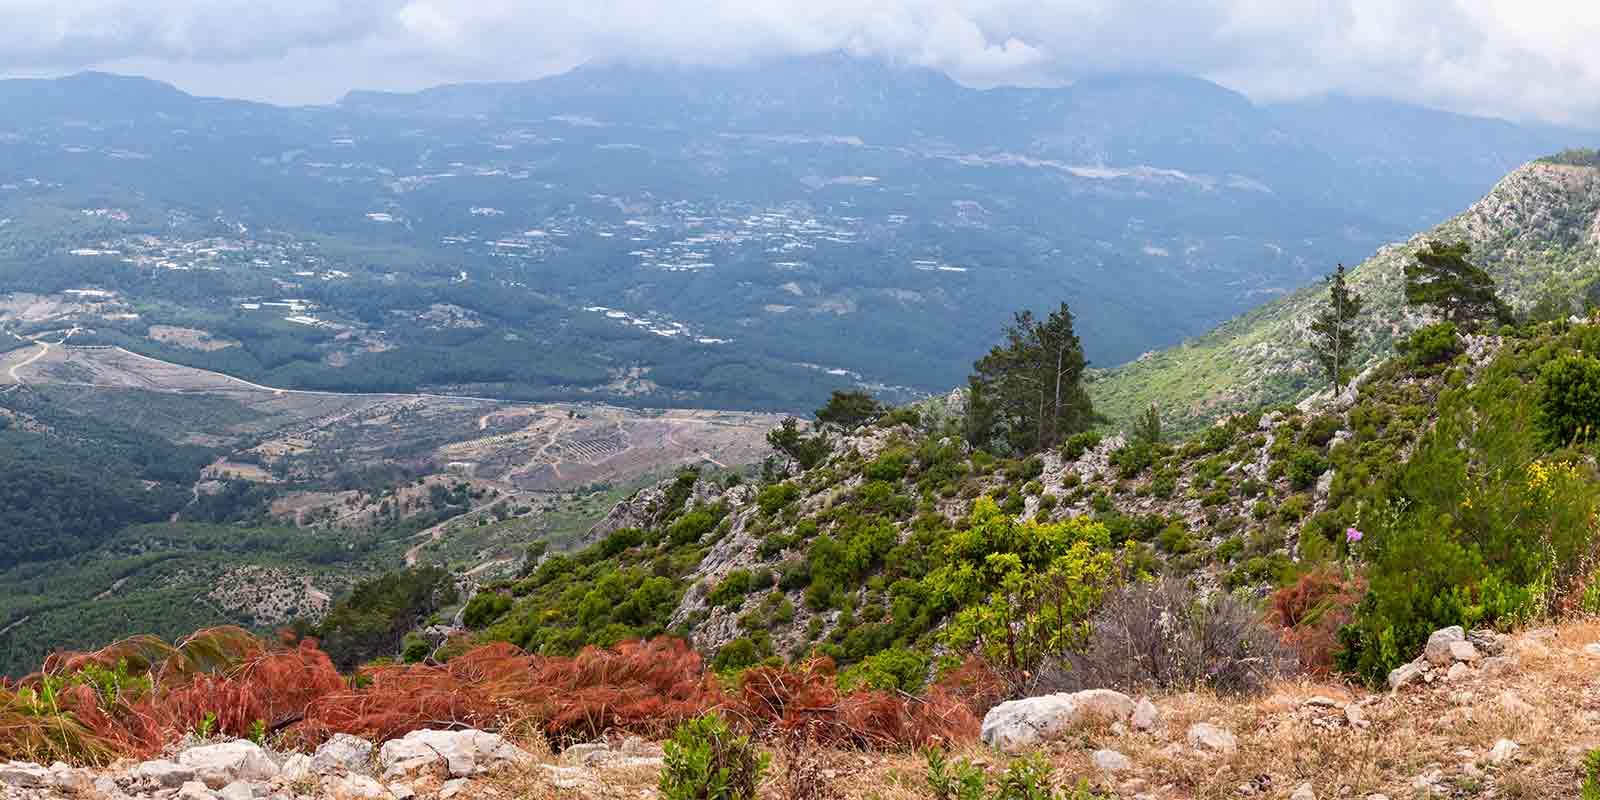 Typical mountain scenery of Turkey's Lycian Way